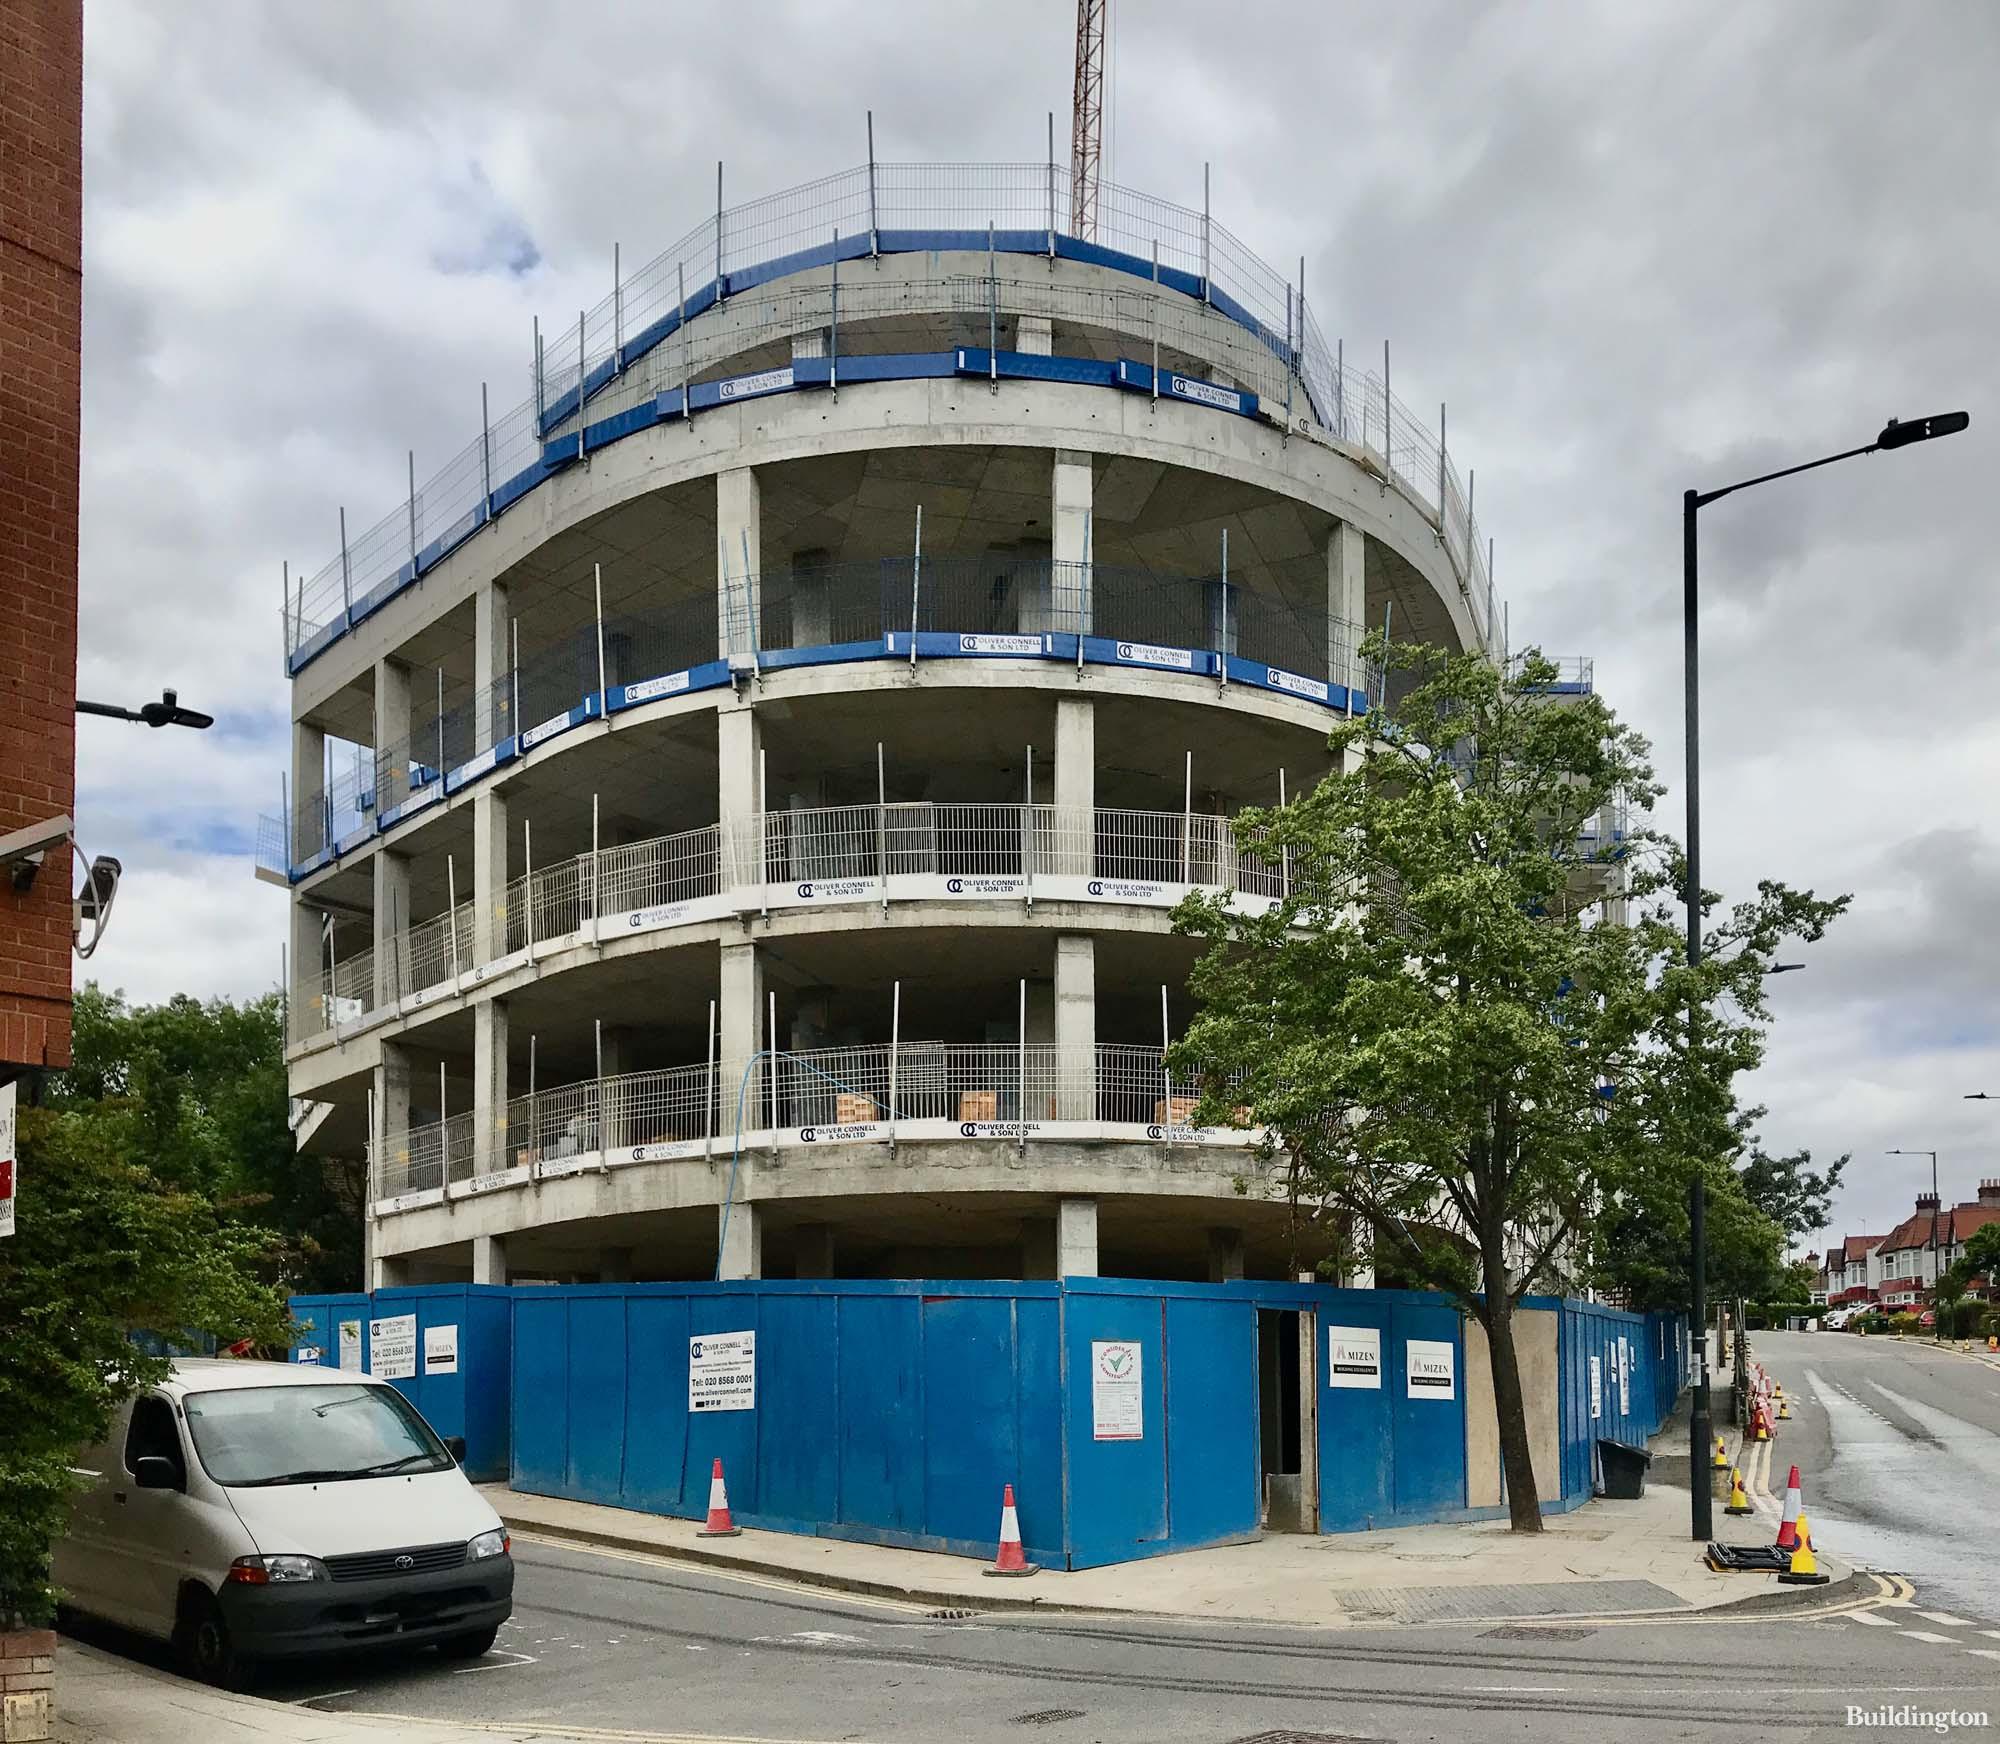 Heron House development under construction in Wembley, Greater London HA9.